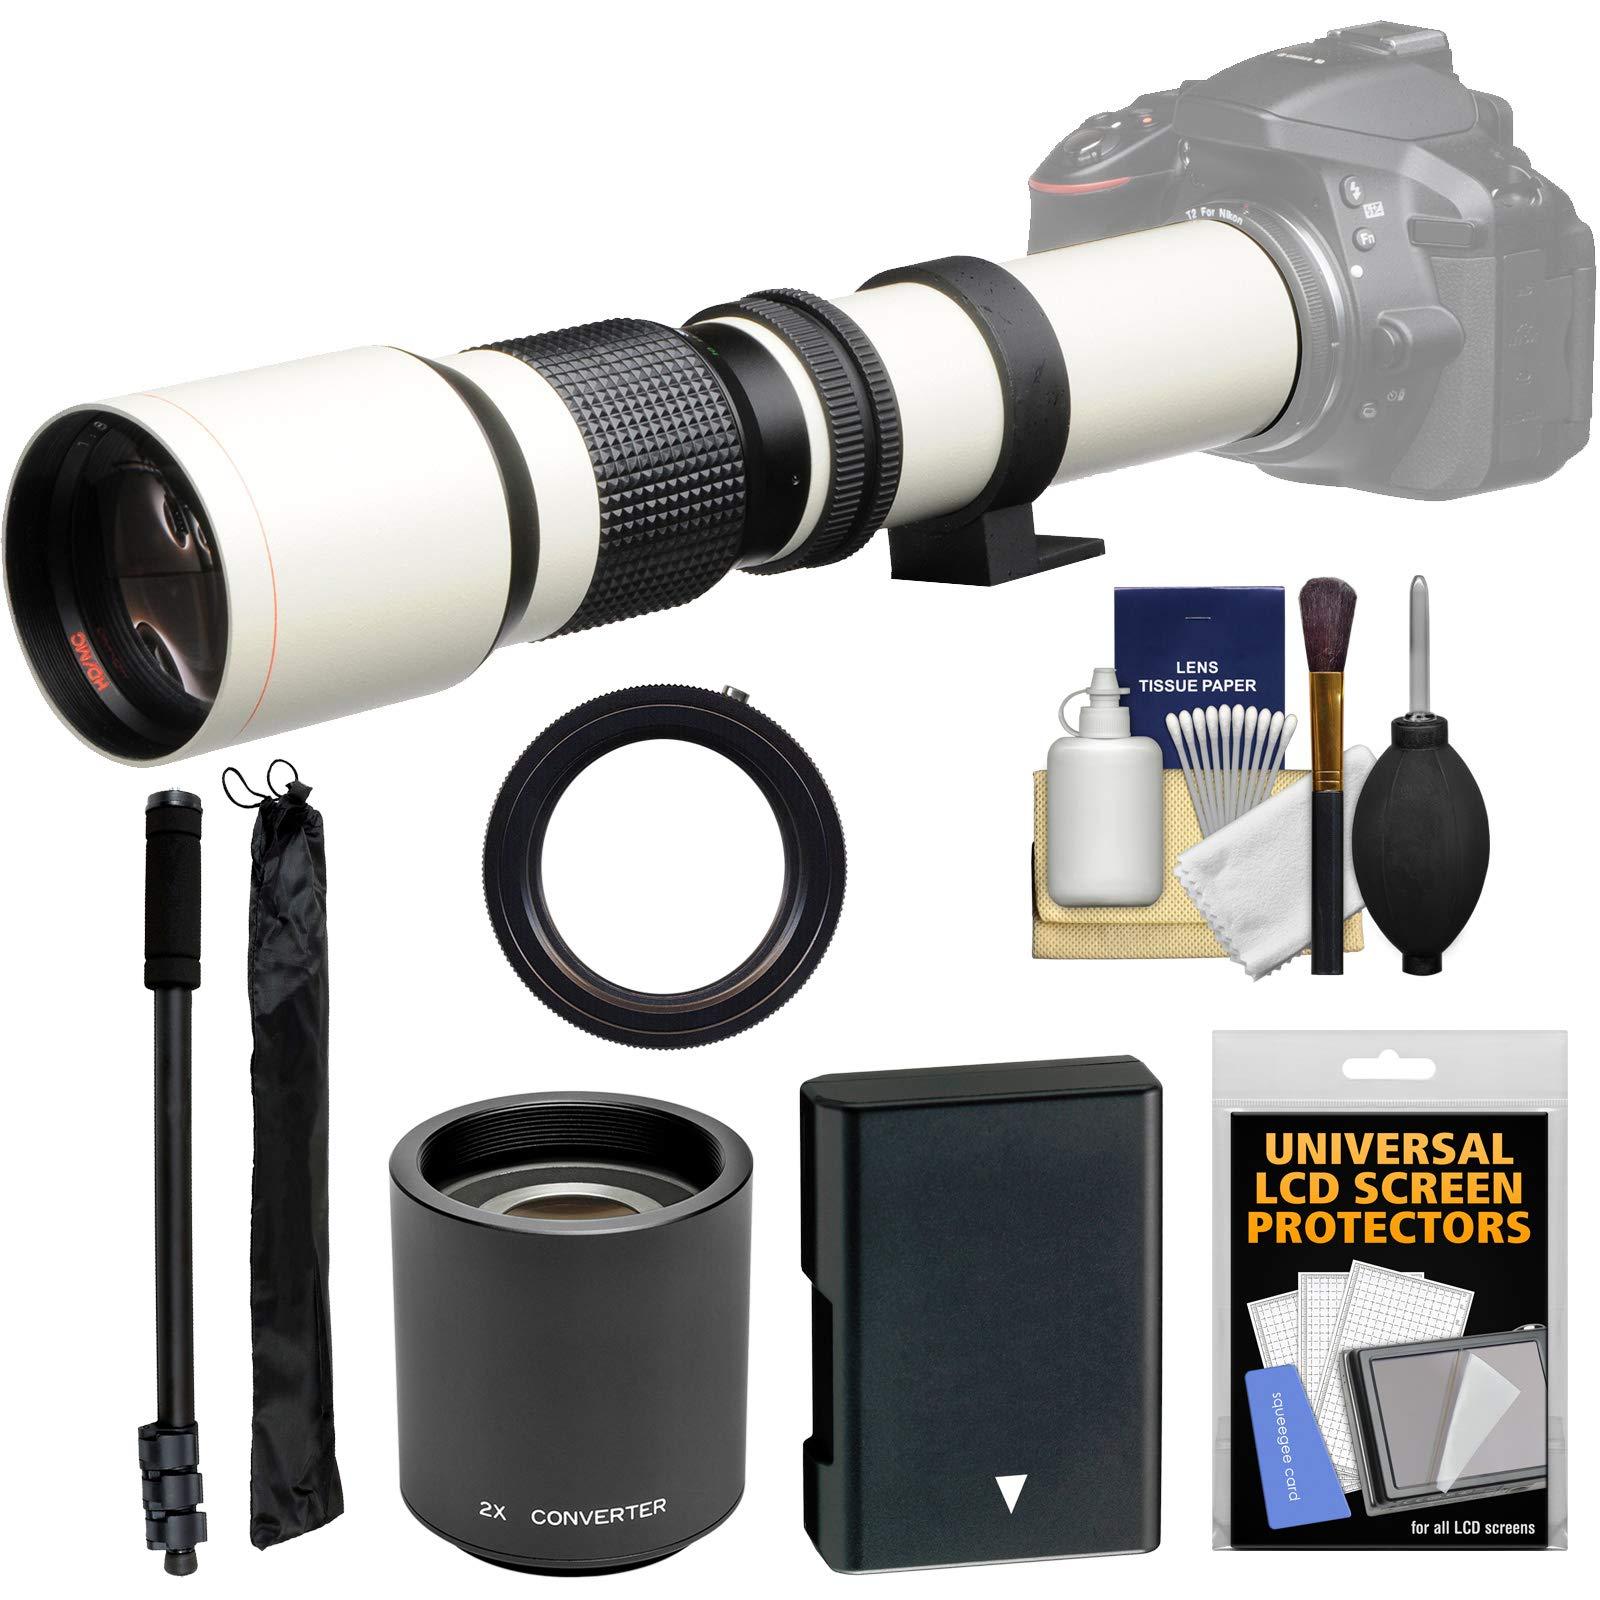 Vivitar 500mm f/8.0 Telephoto Lens (T Mount) (White) with 2X Teleconverter (=1000mm) + EN-EL14 Battery + Monopod + Kit for D3300, D3400, D5300, D5500, D5600 by Vivitar